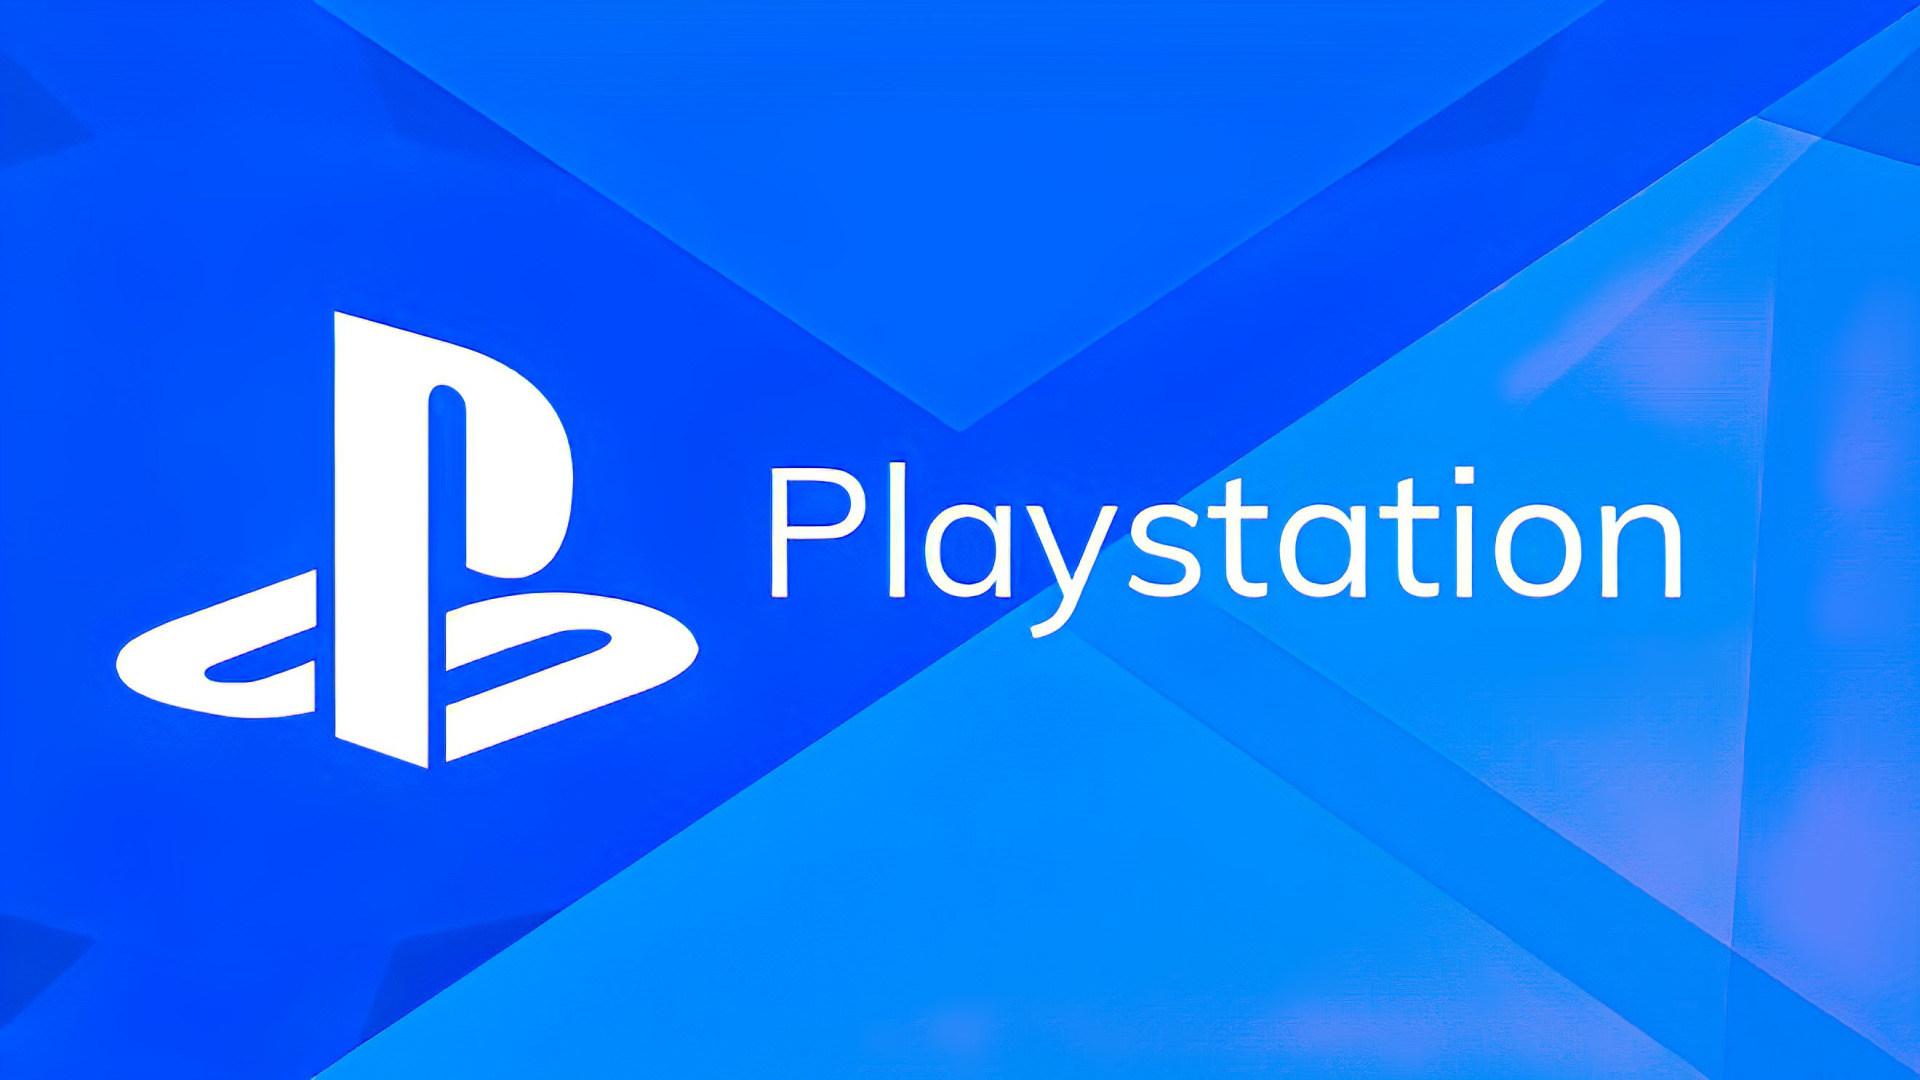 Konsole, Sony, PlayStation 4, Playstation, Konsolen, PS4, Spielekonsole, Spielekonsolen, PlayStation 5, ps5, Sony PlayStation 5, 739700